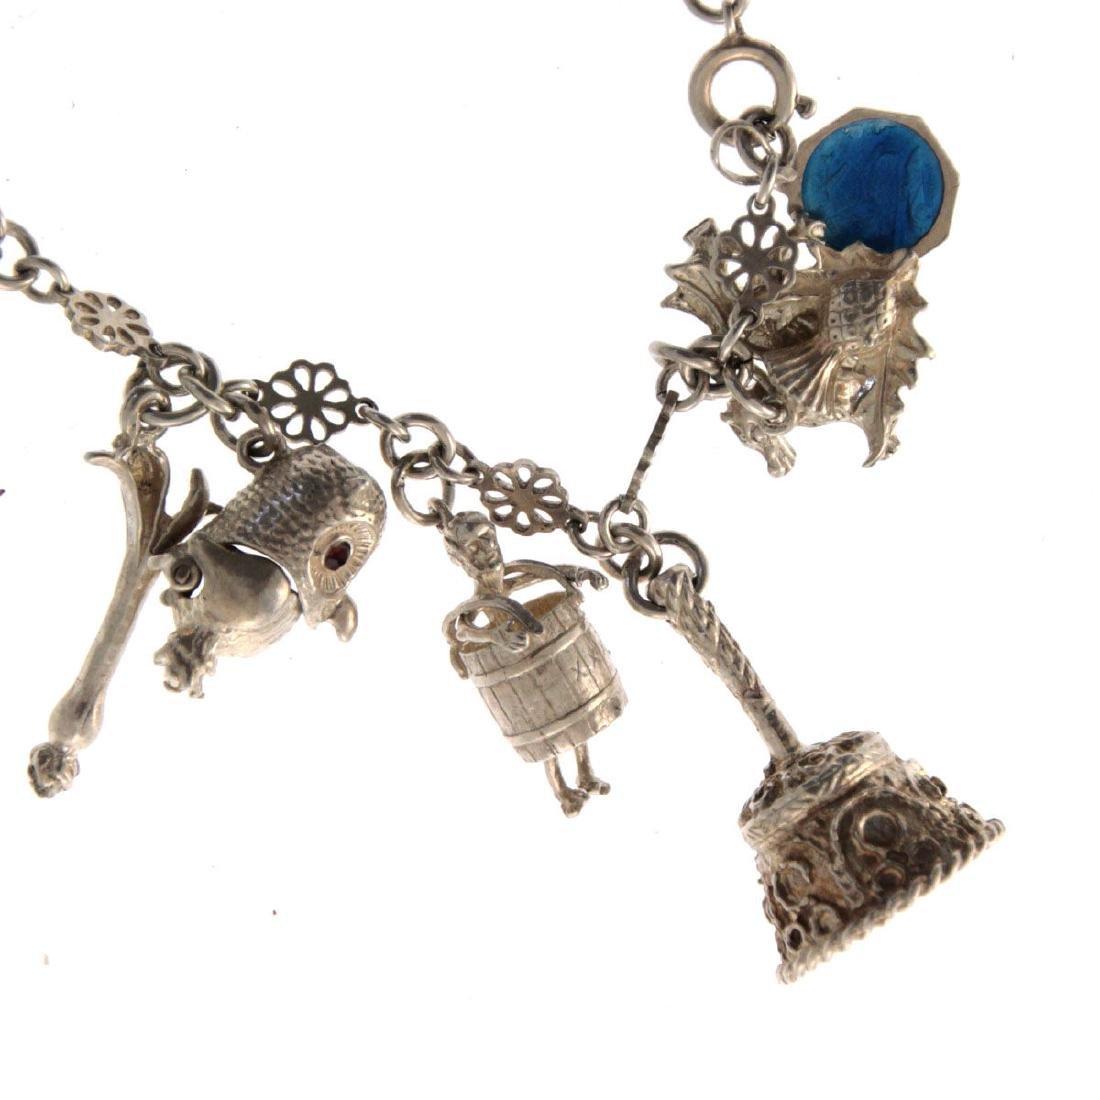 Sterling Silver Charm Bracelet. - 3